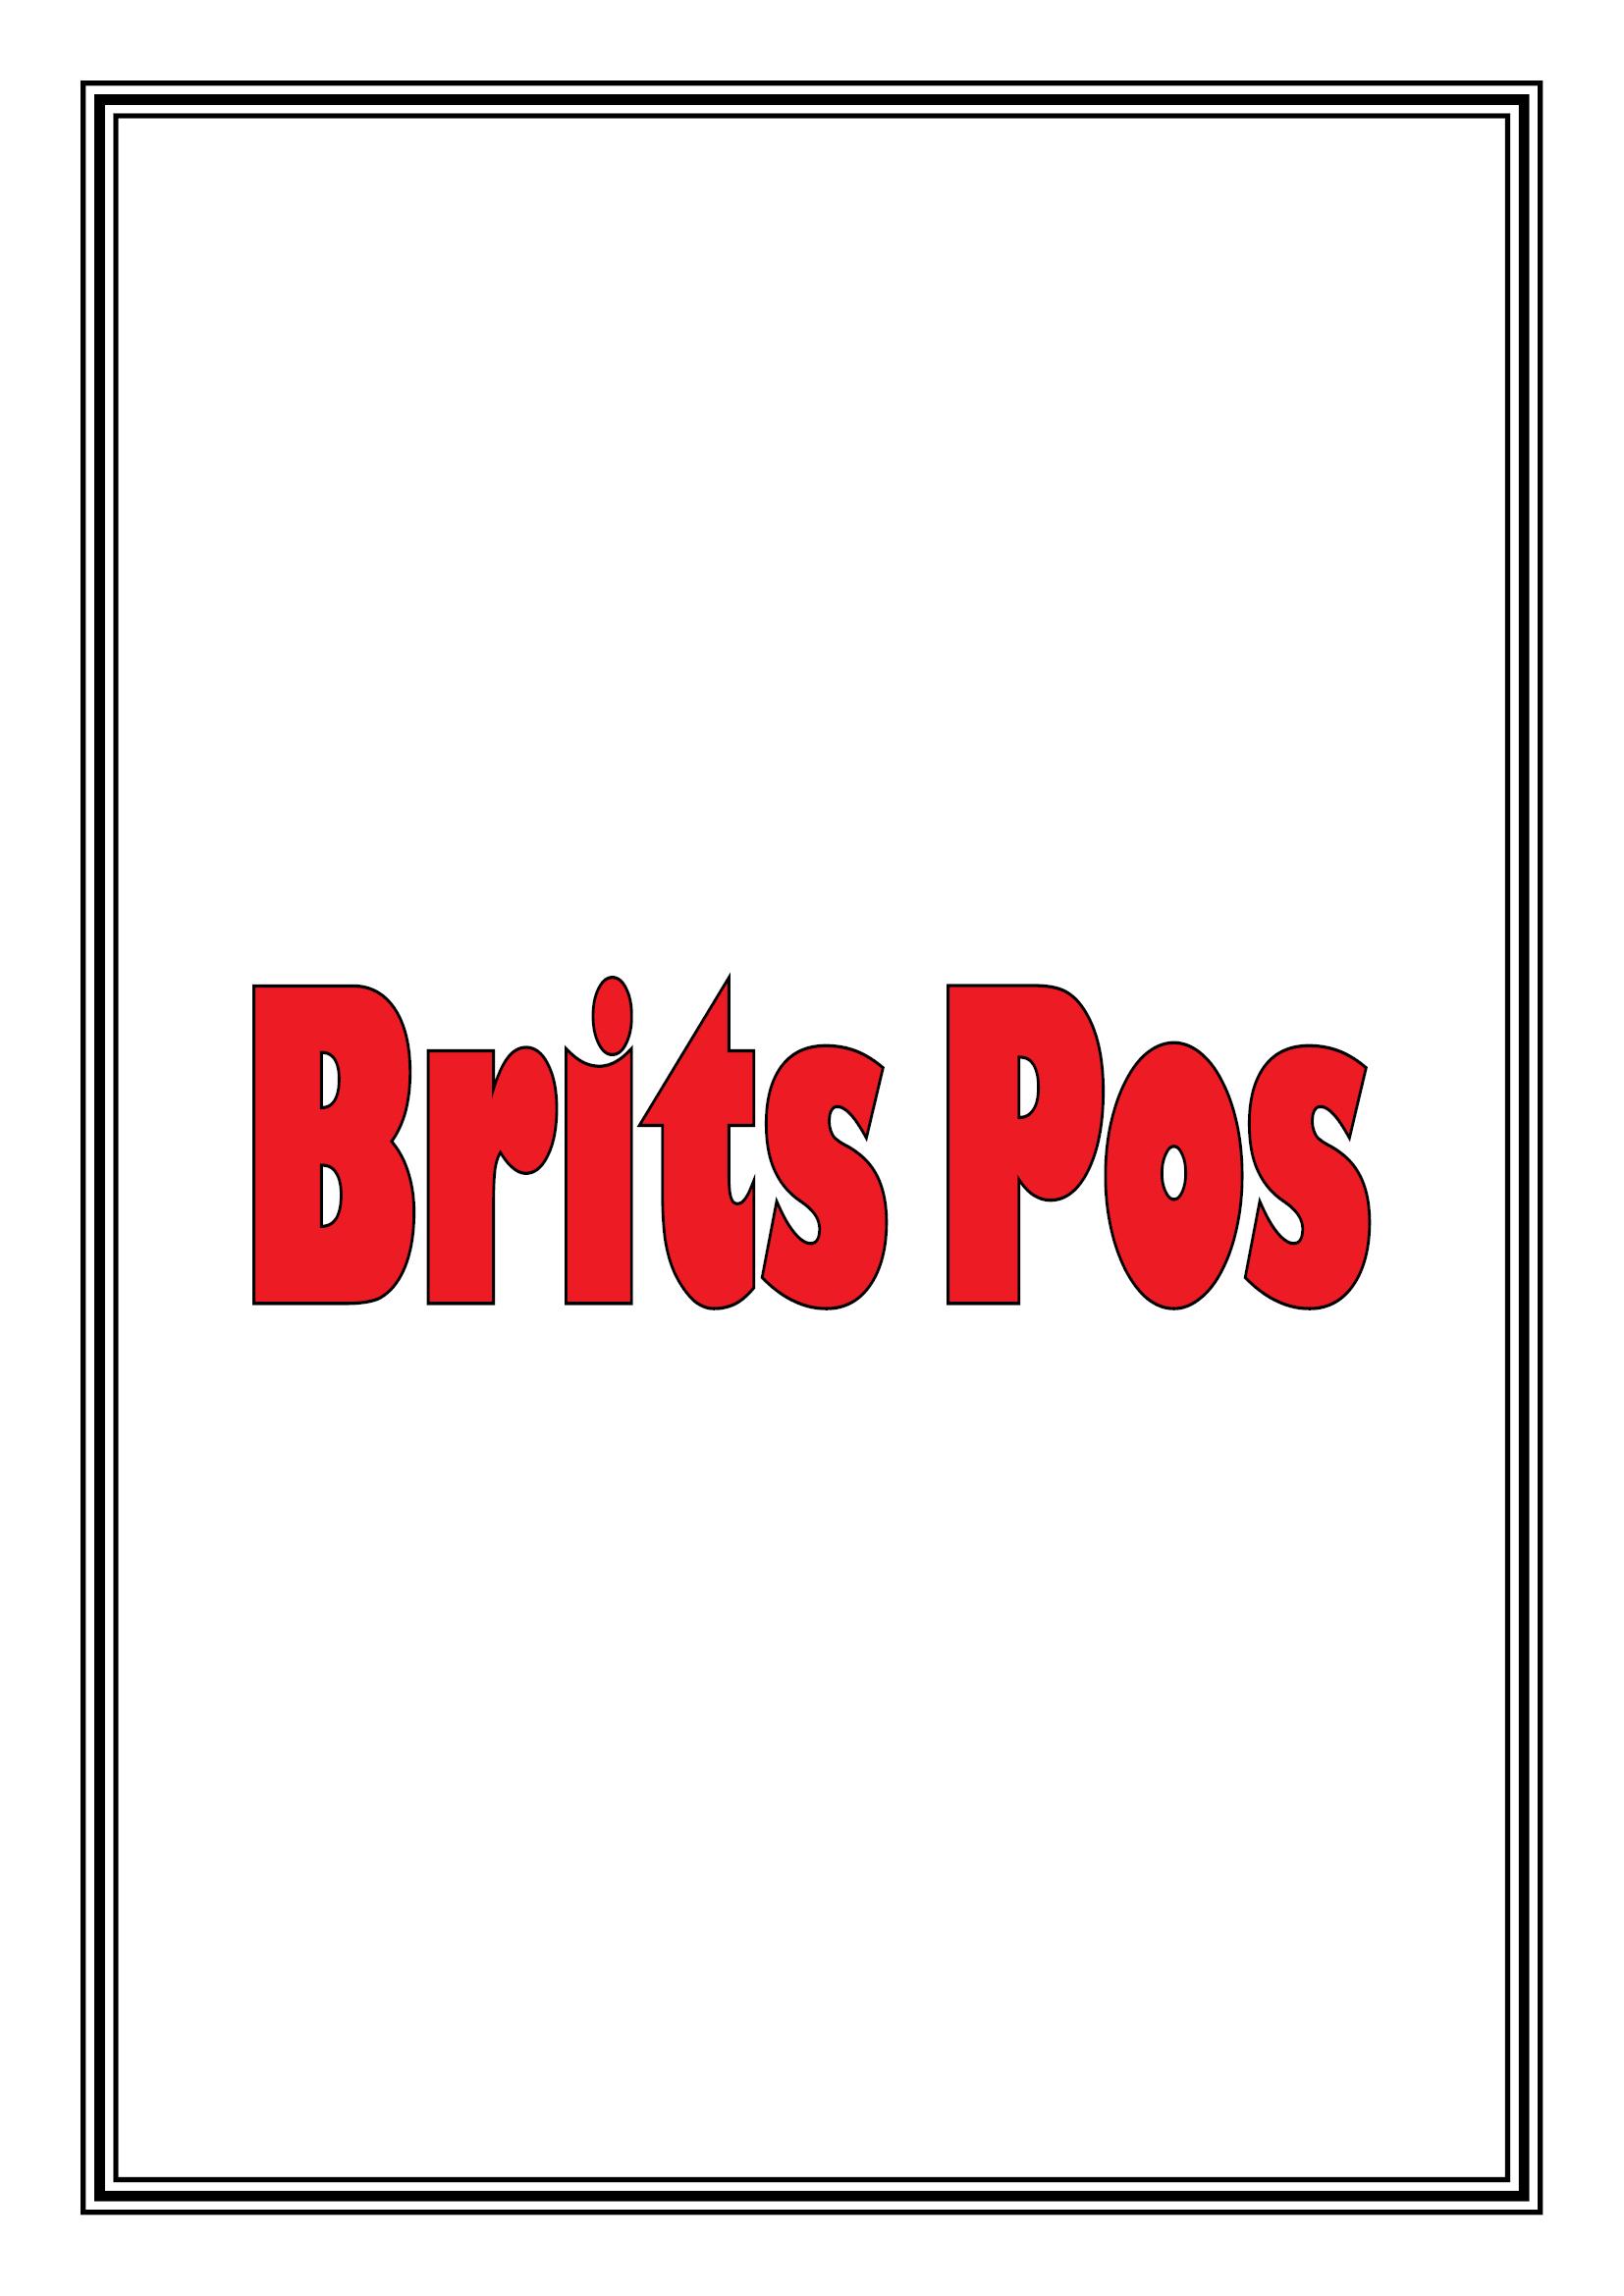 Brits Pos